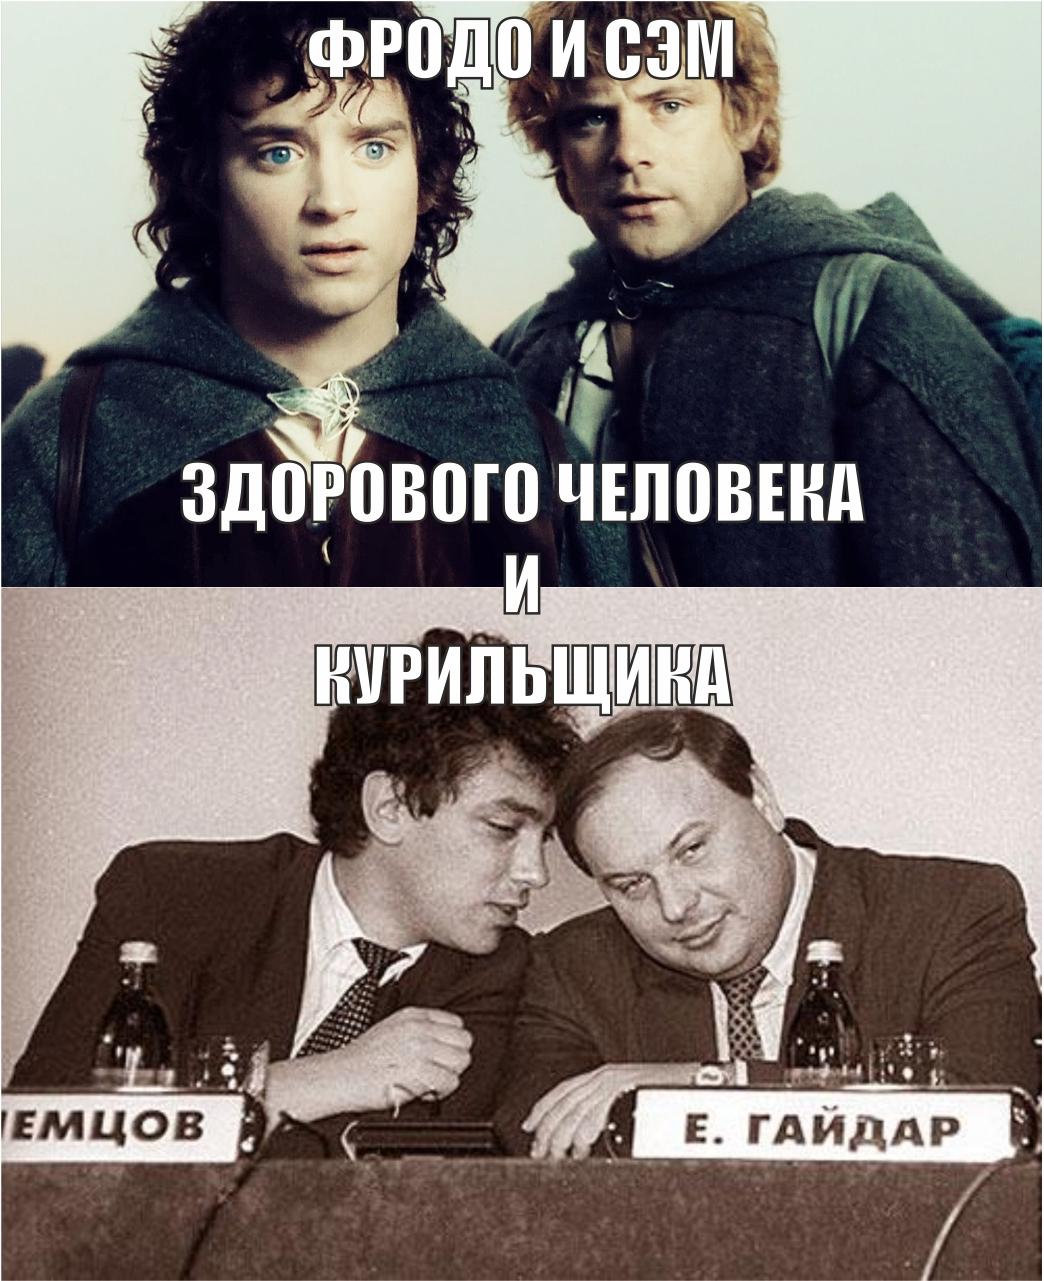 Фродо и Сэм курильщика